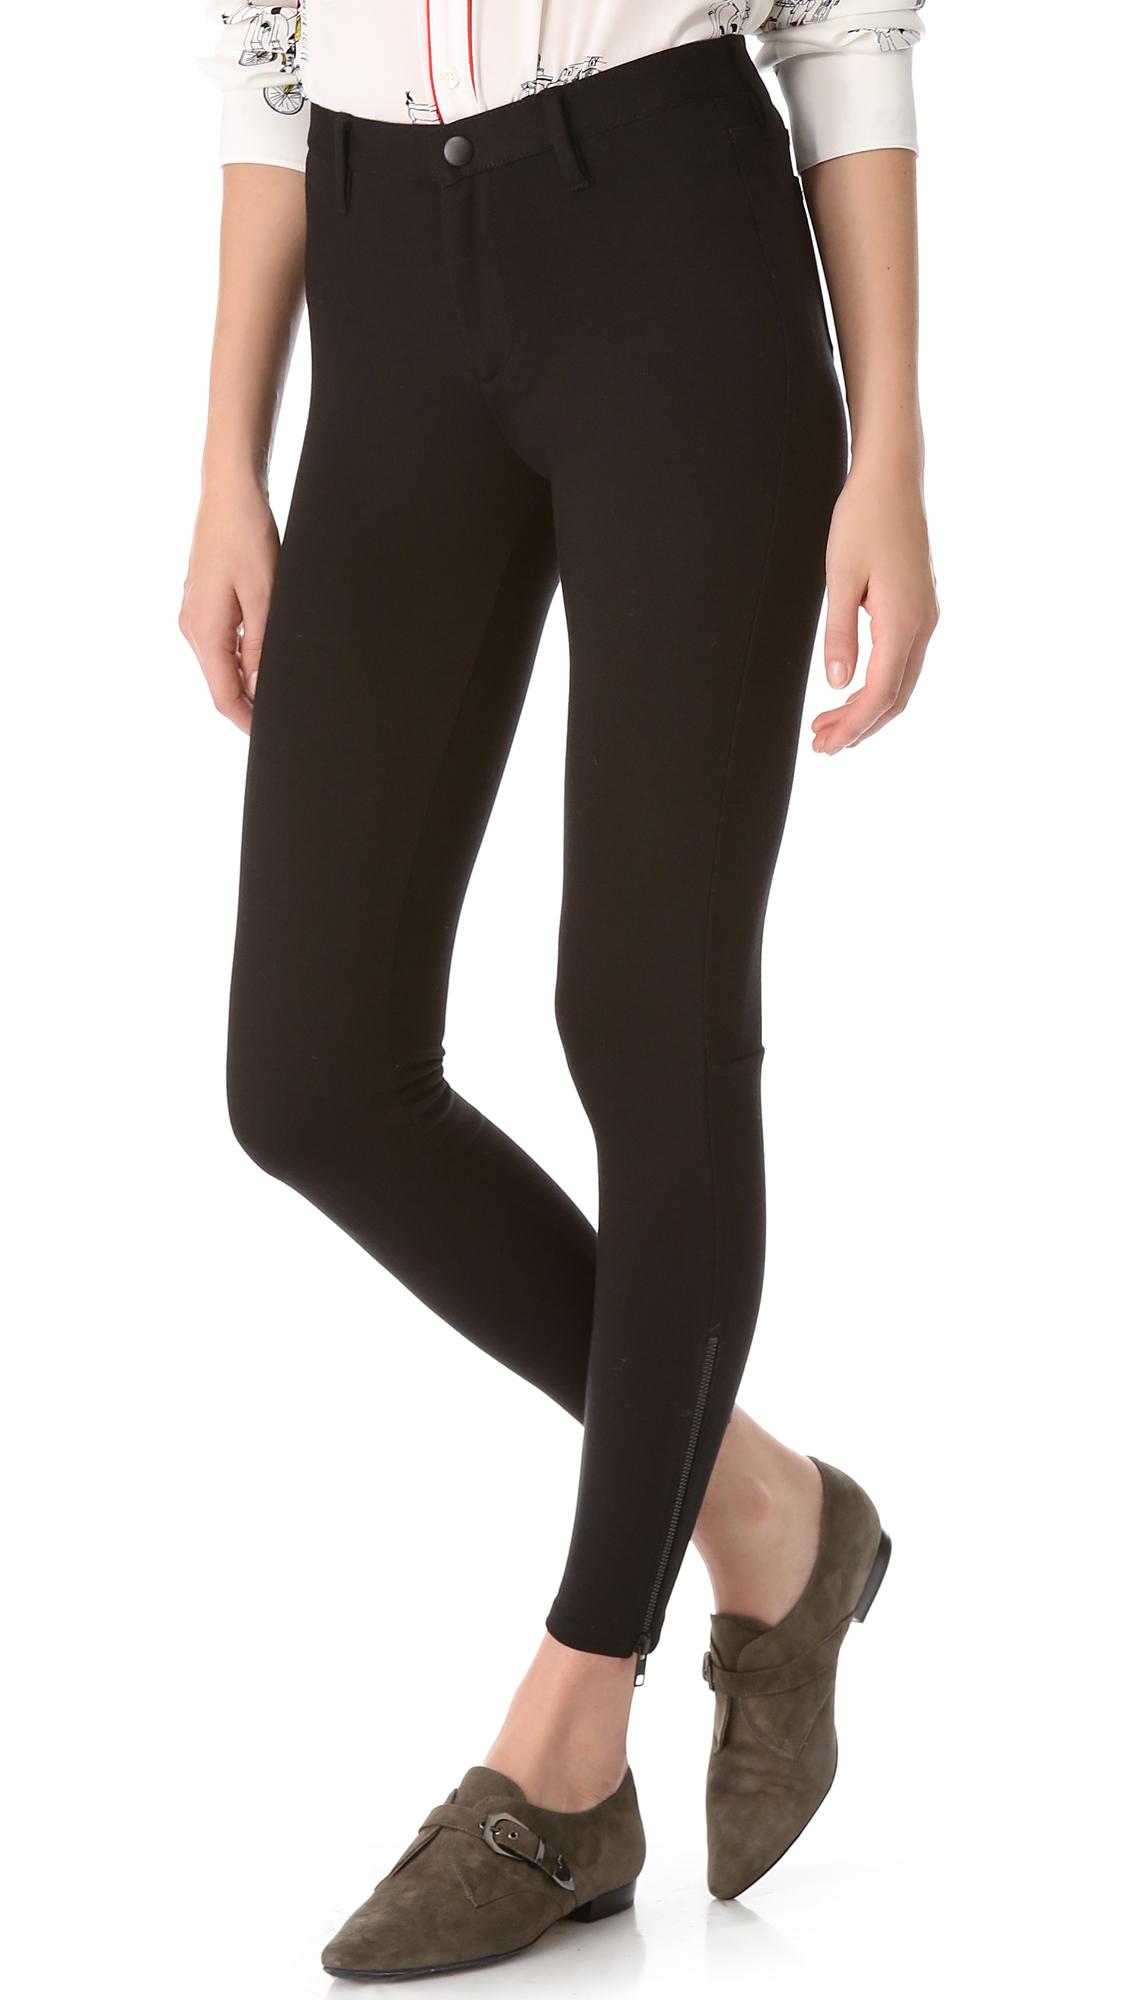 89e050f8dbd80 Lyst - Madewell Ponte Skinny Pants in Black